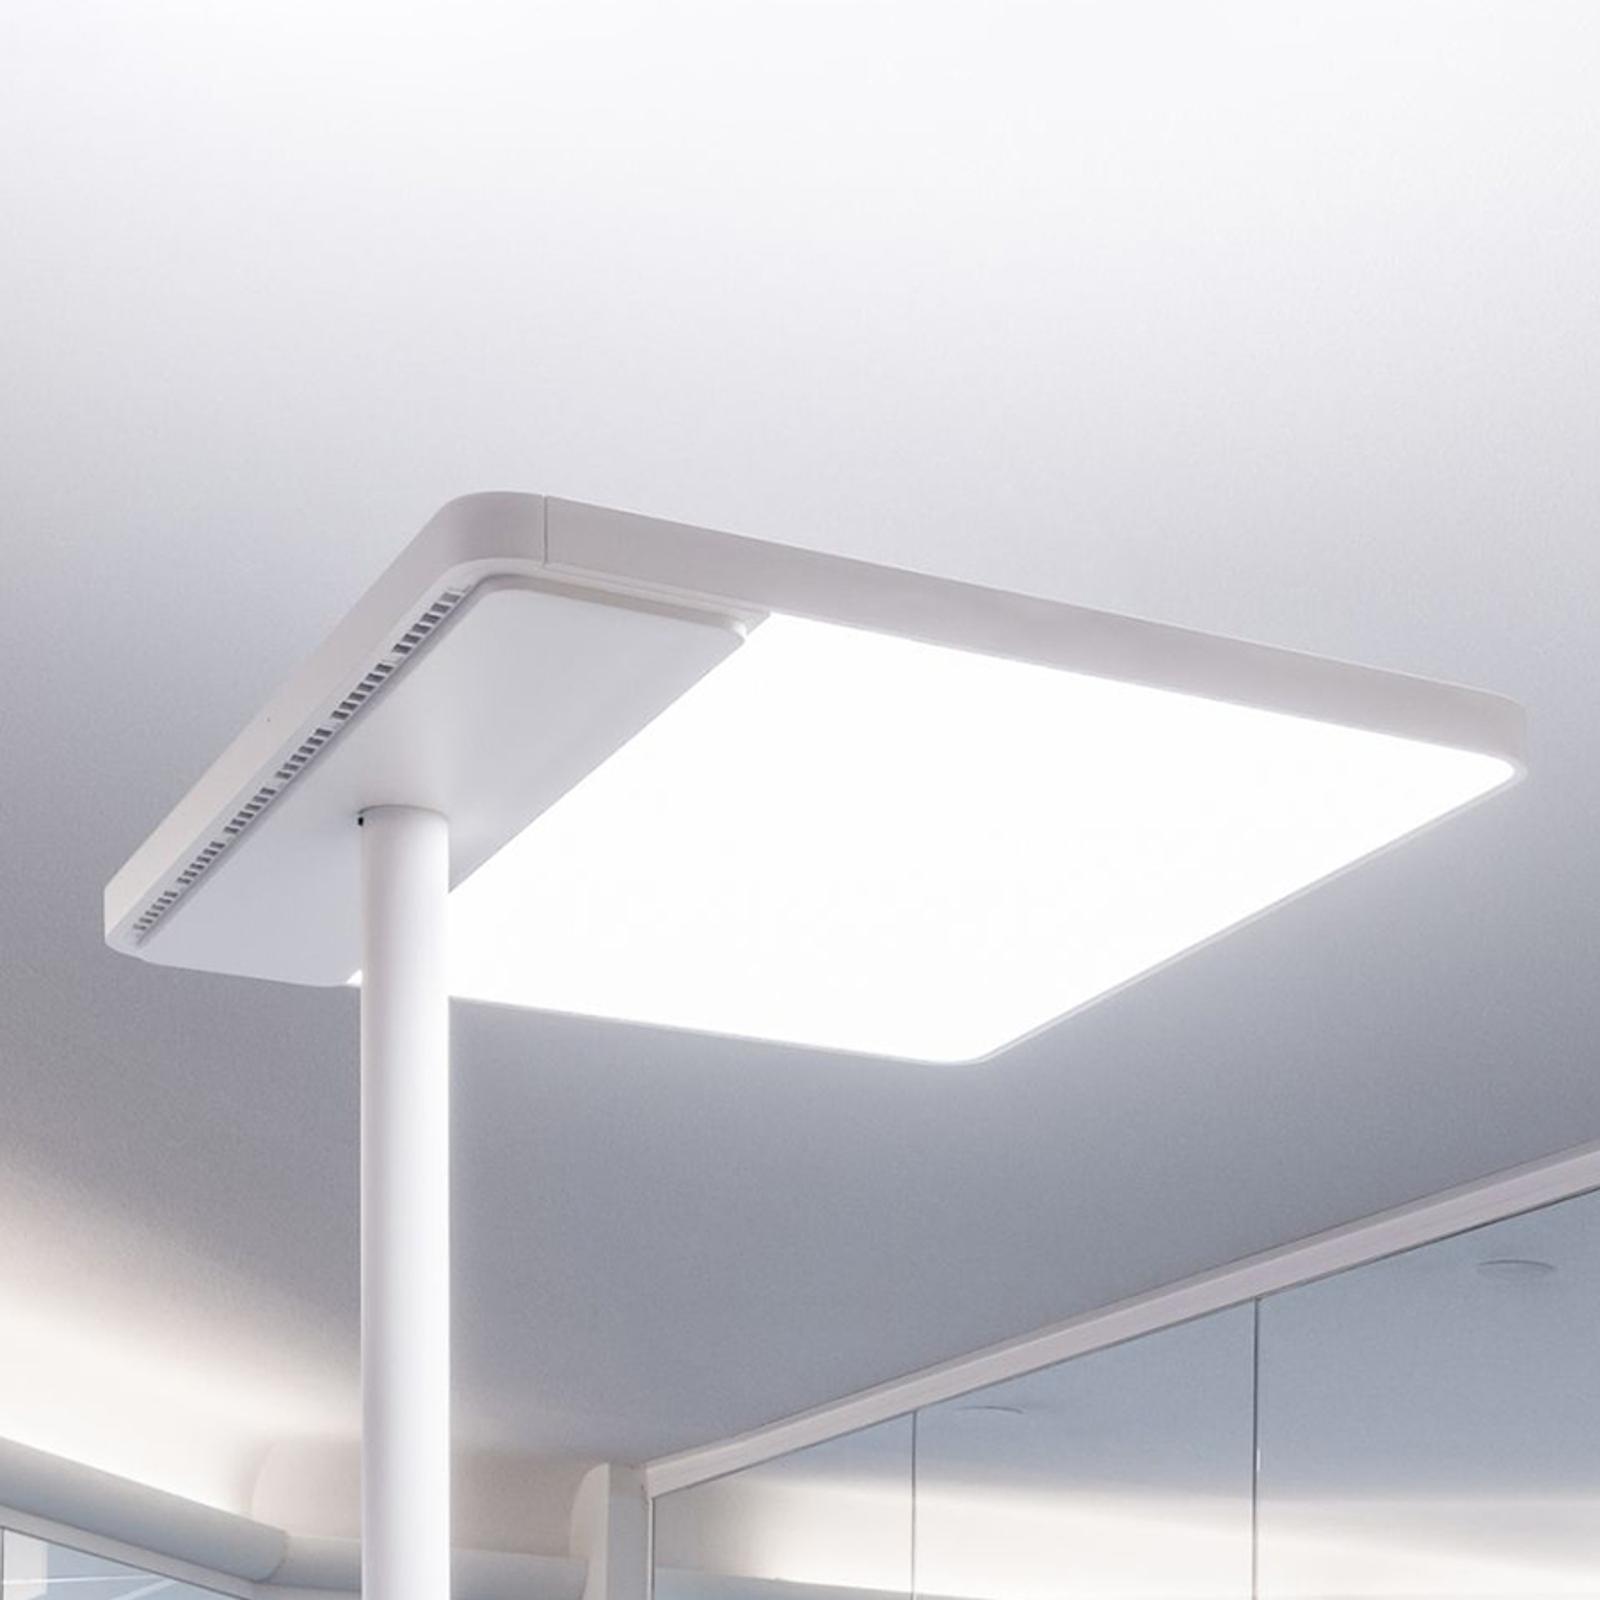 Lampadaire de bureau LED Linea-F variateur tactile